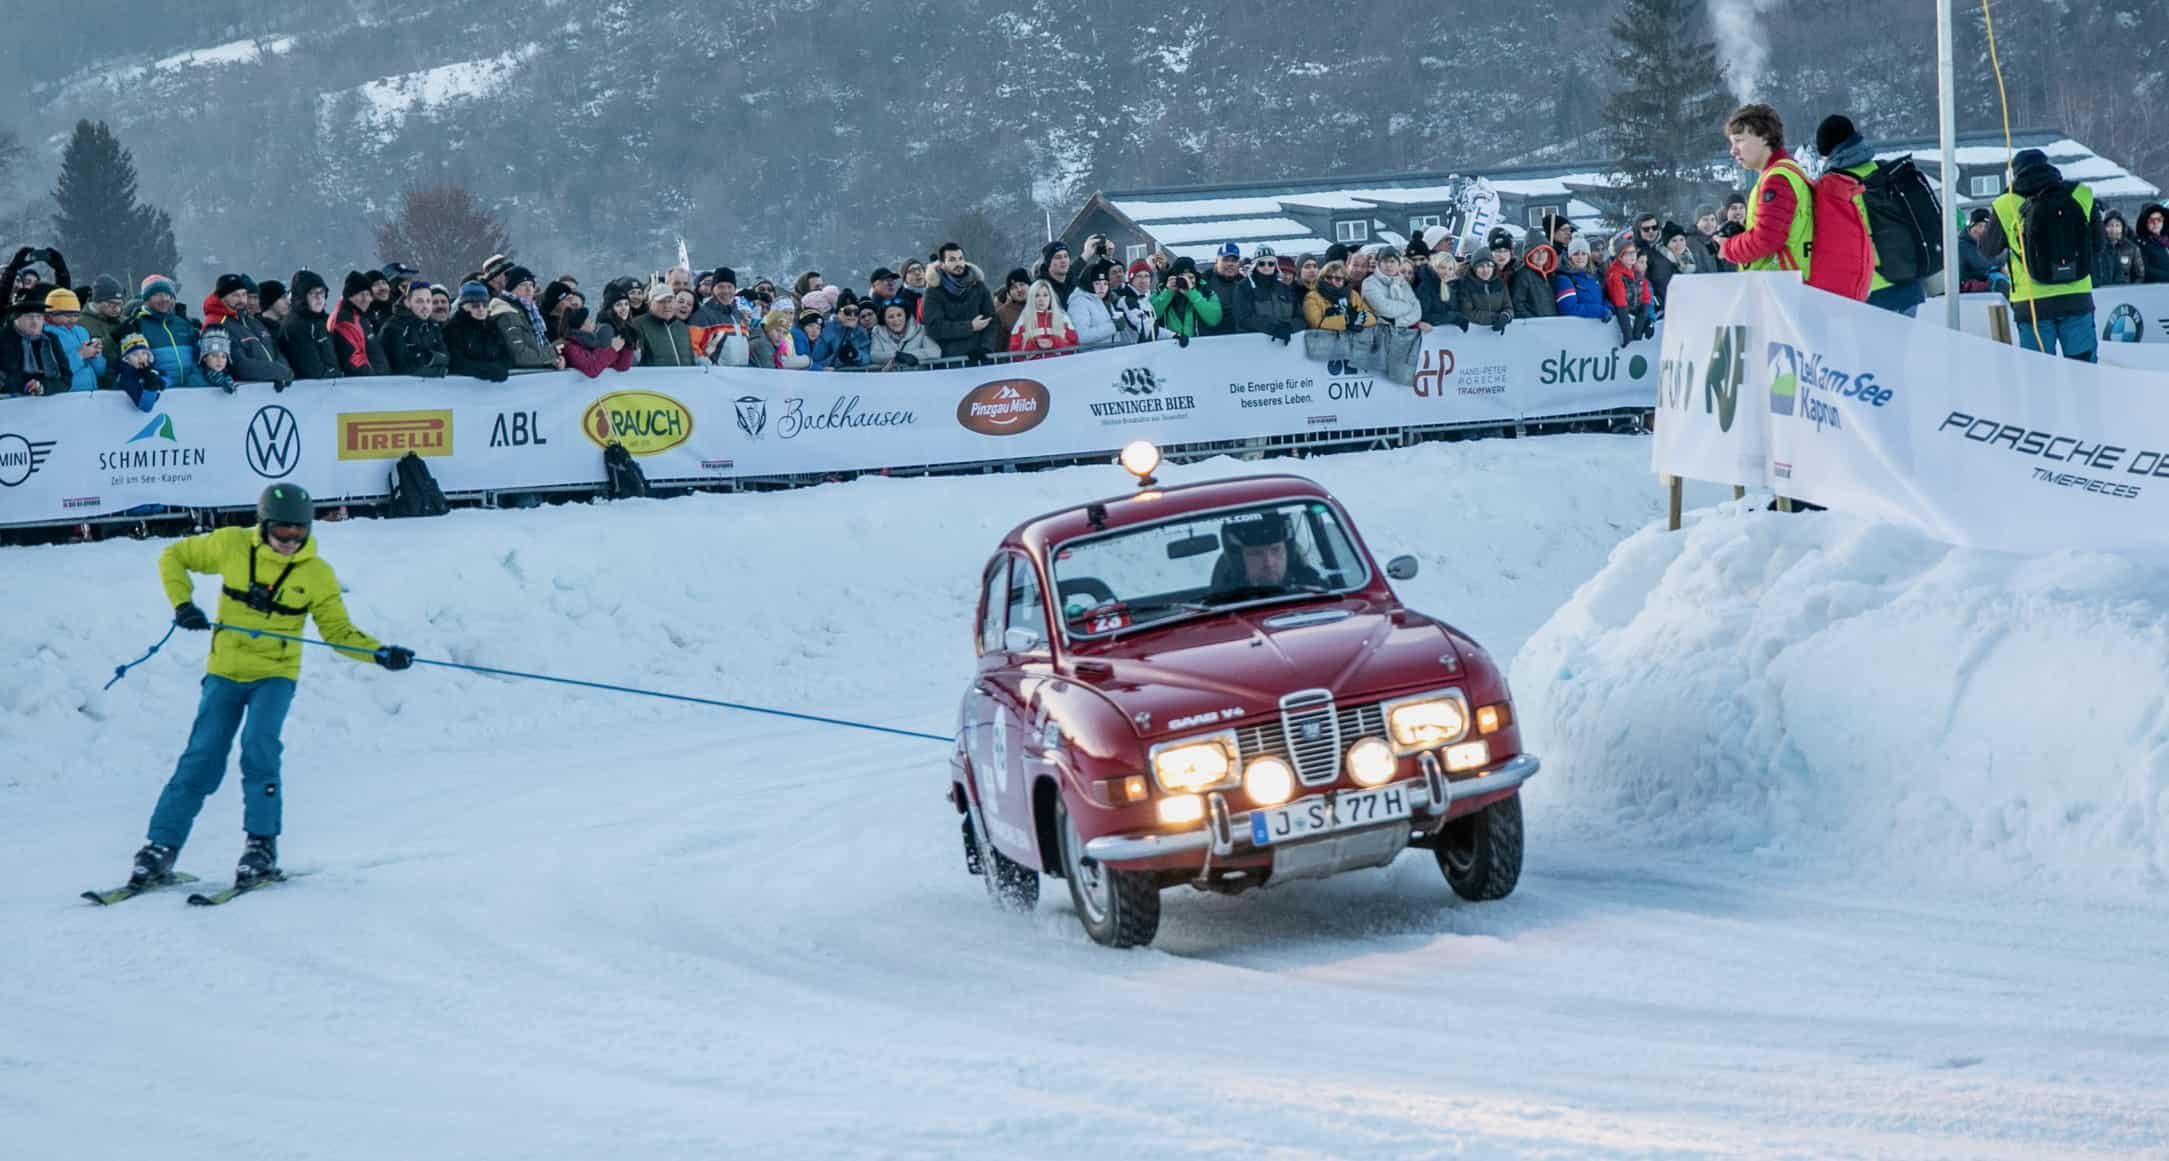 Ice racing, Skijoring among Austrian ice racing highlights, ClassicCars.com Journal